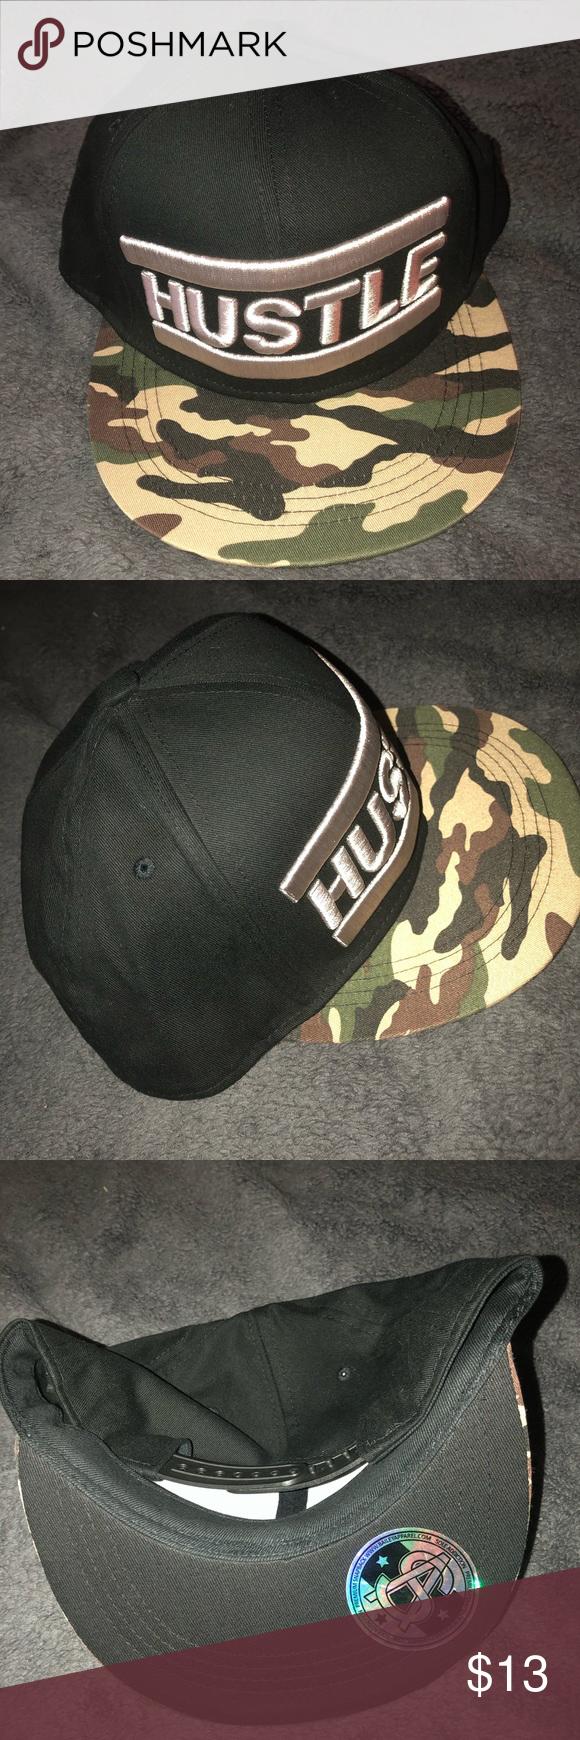 Brixton Limited James Ltd Hat Fawn Hats For Men Hats Headwear